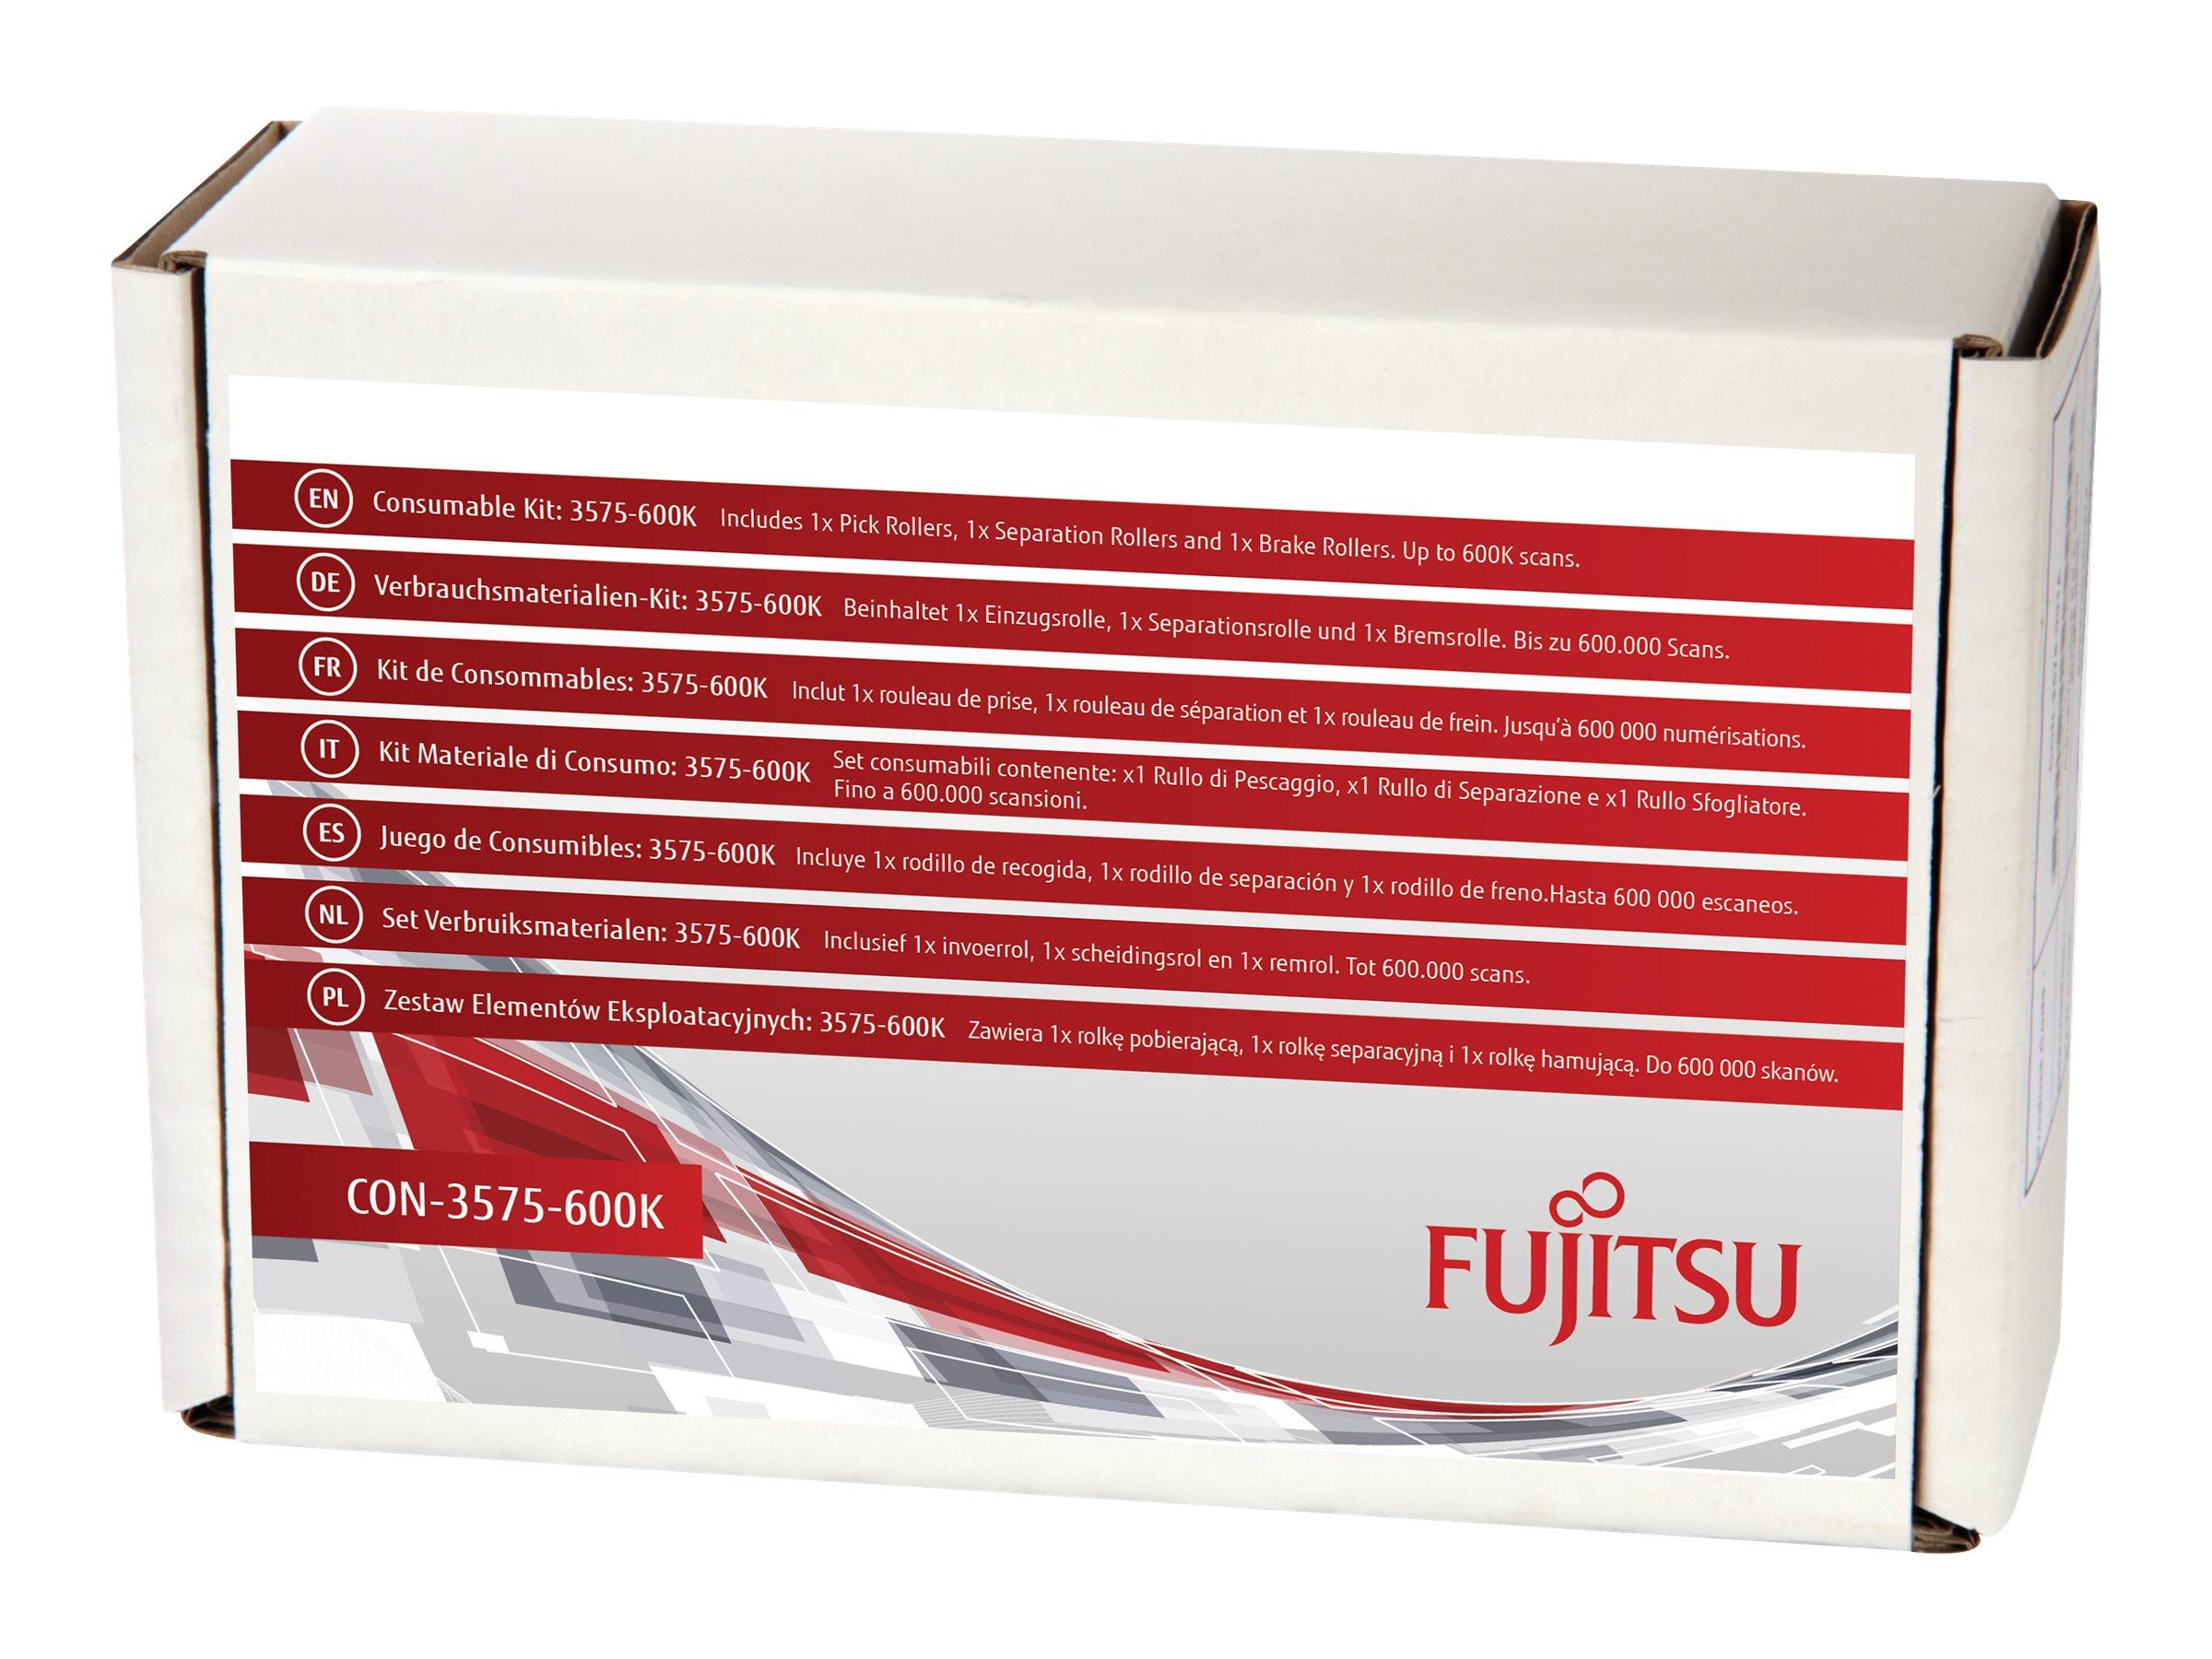 Fujitsu Consumable Kit: 3575-600K - Scanner - Verbrauchsmaterialienkit